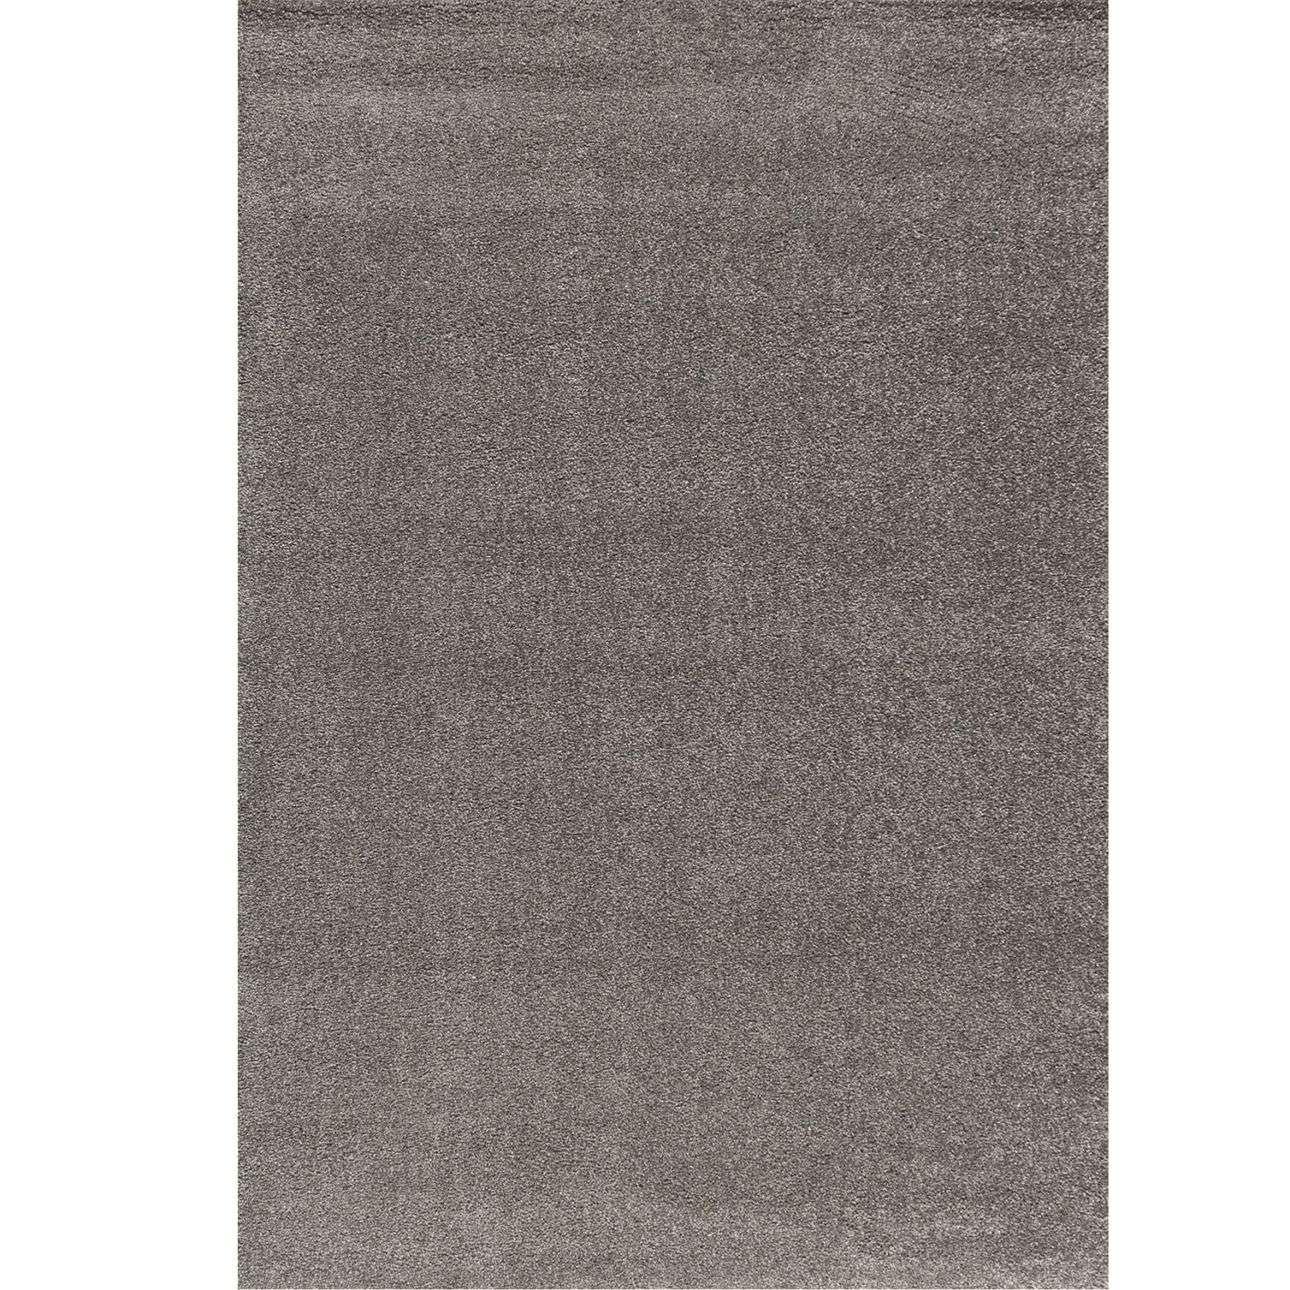 Dywan Deluxe Grey/silver 160x230cm  160x230cm